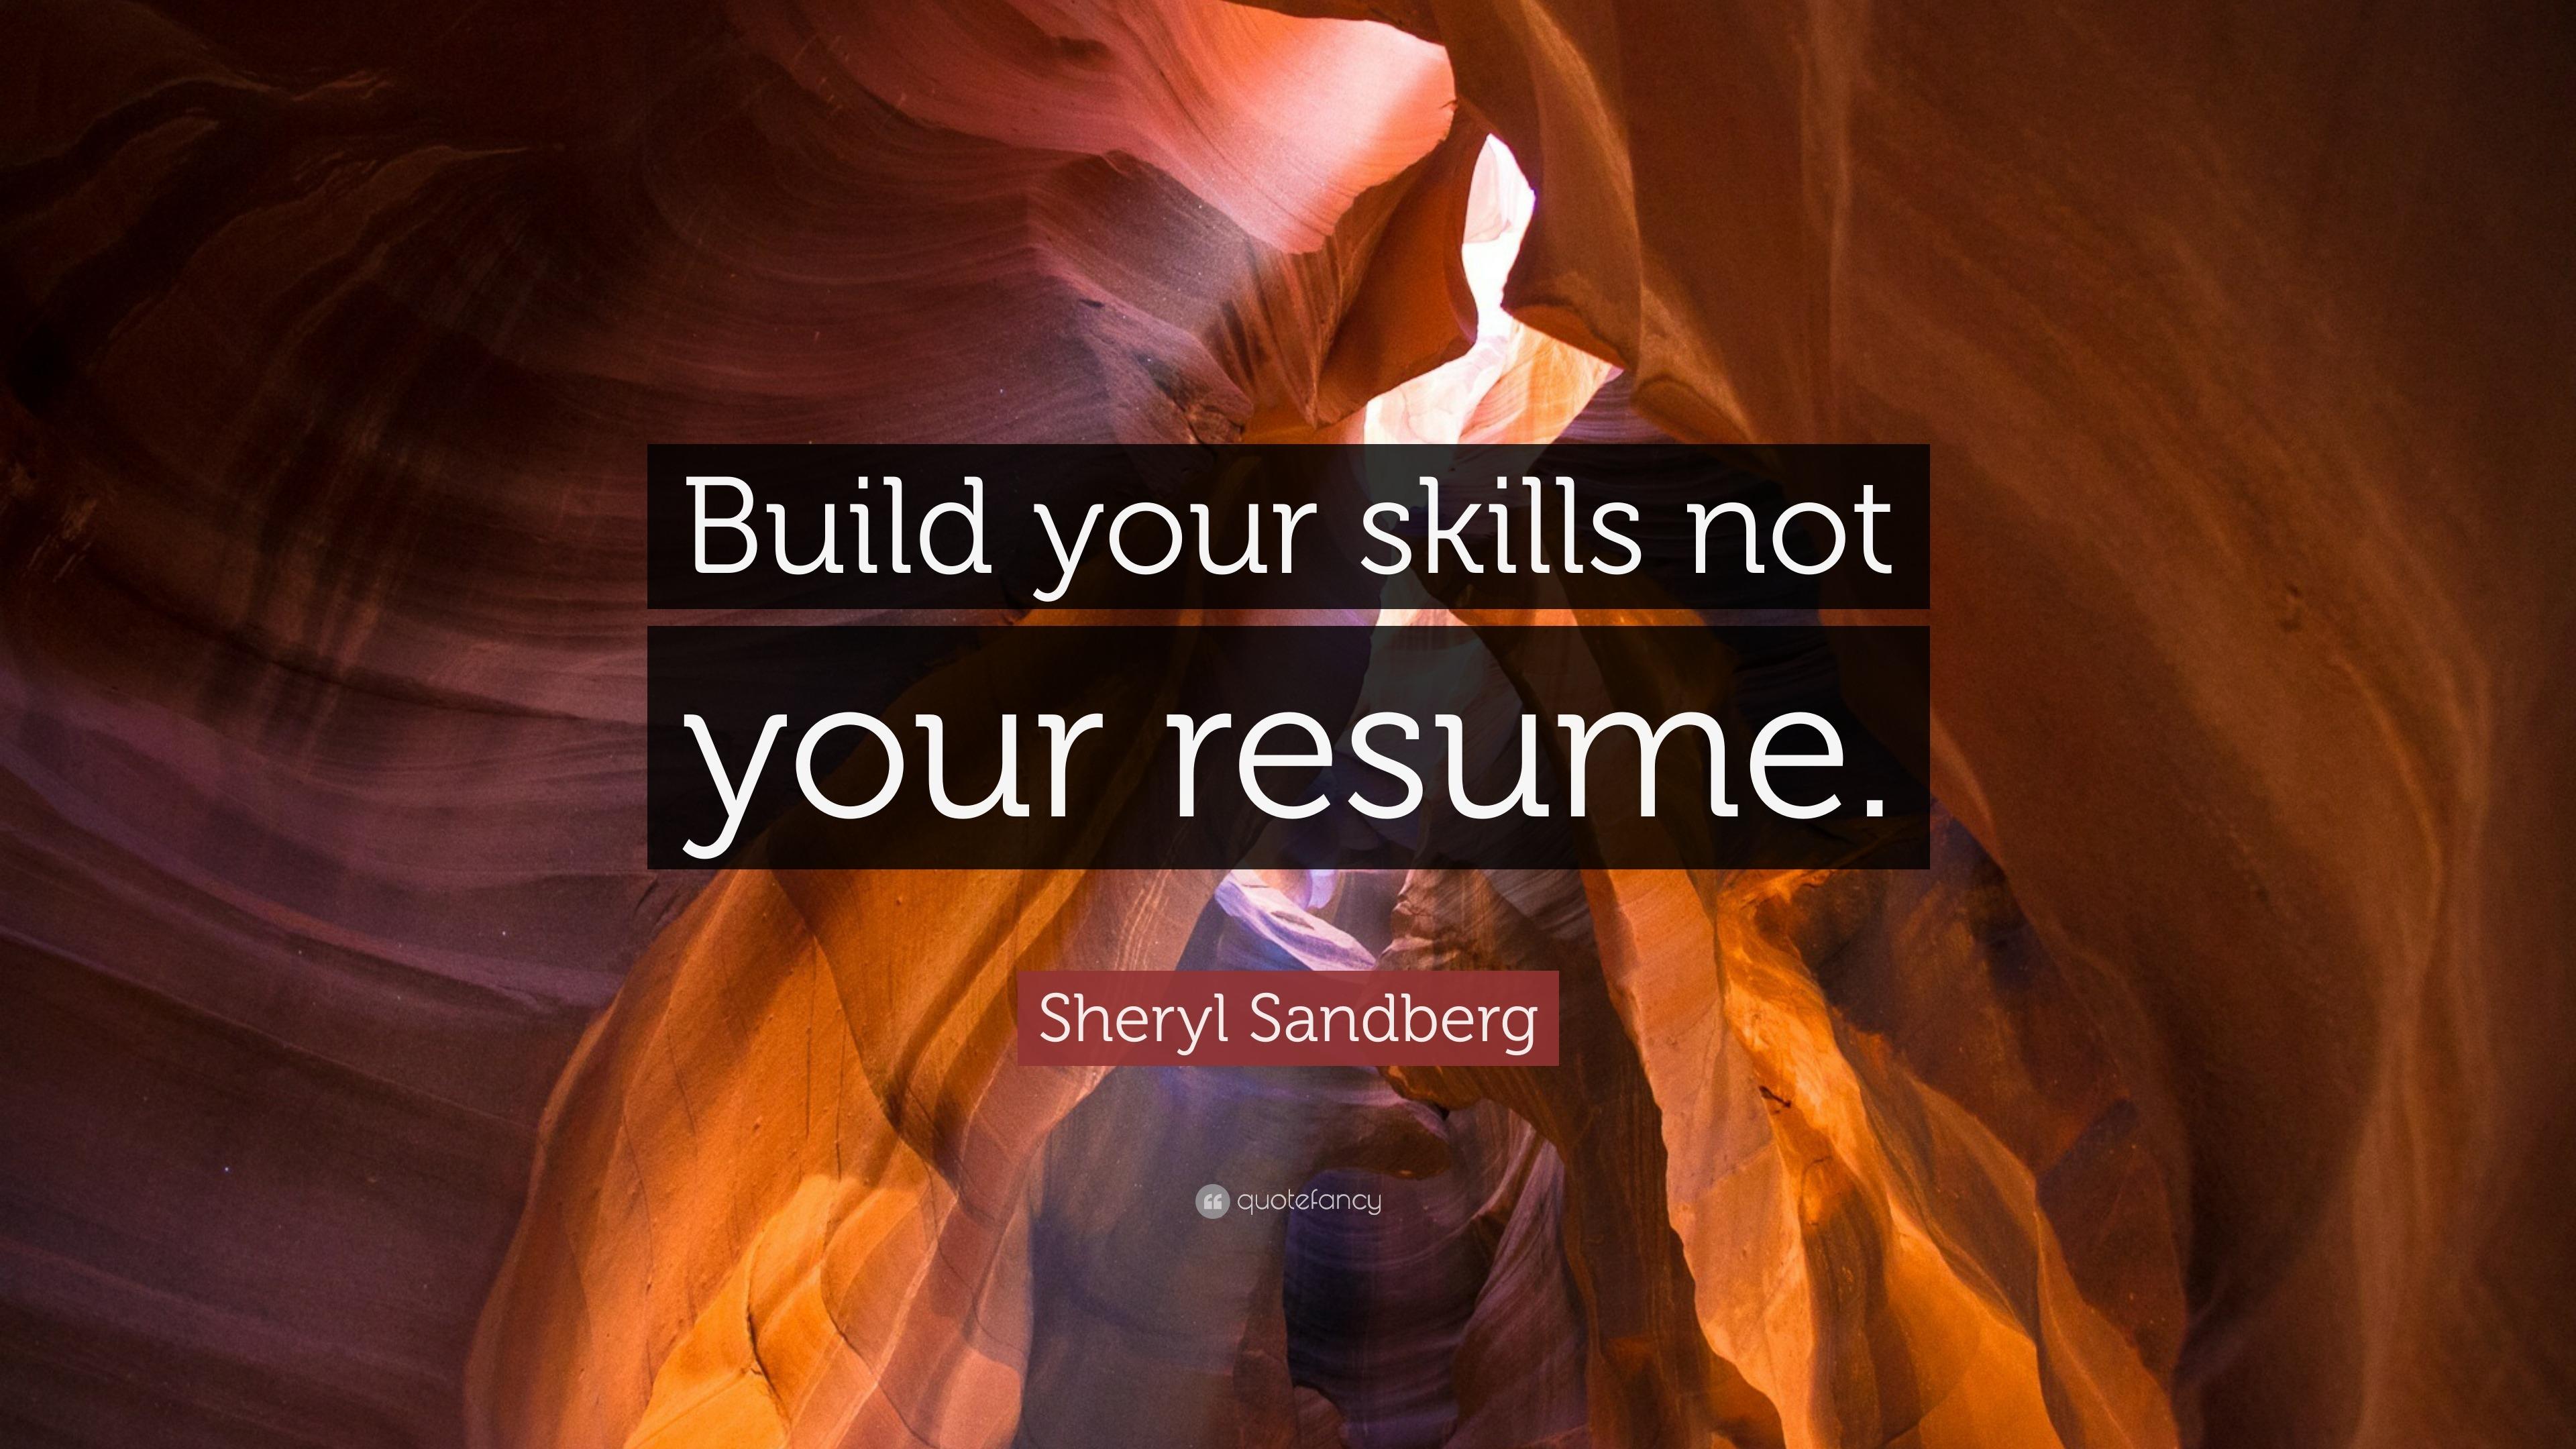 Sheryl Sandberg Quote: U201cBuild Your Skills Not Your Resume.u201d  Sheryl Sandberg Resume